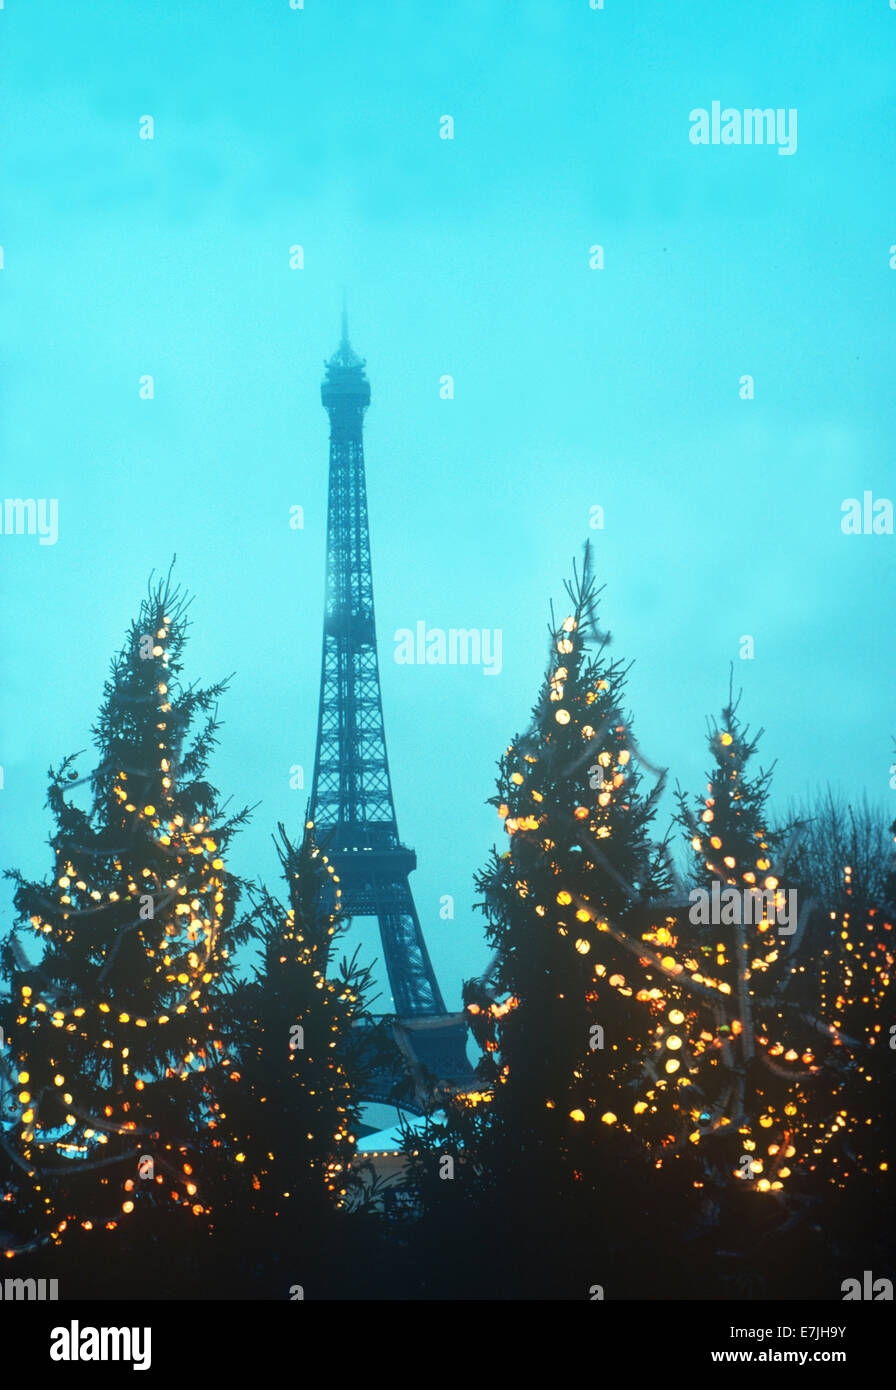 christmas trees eiffel tower paris france